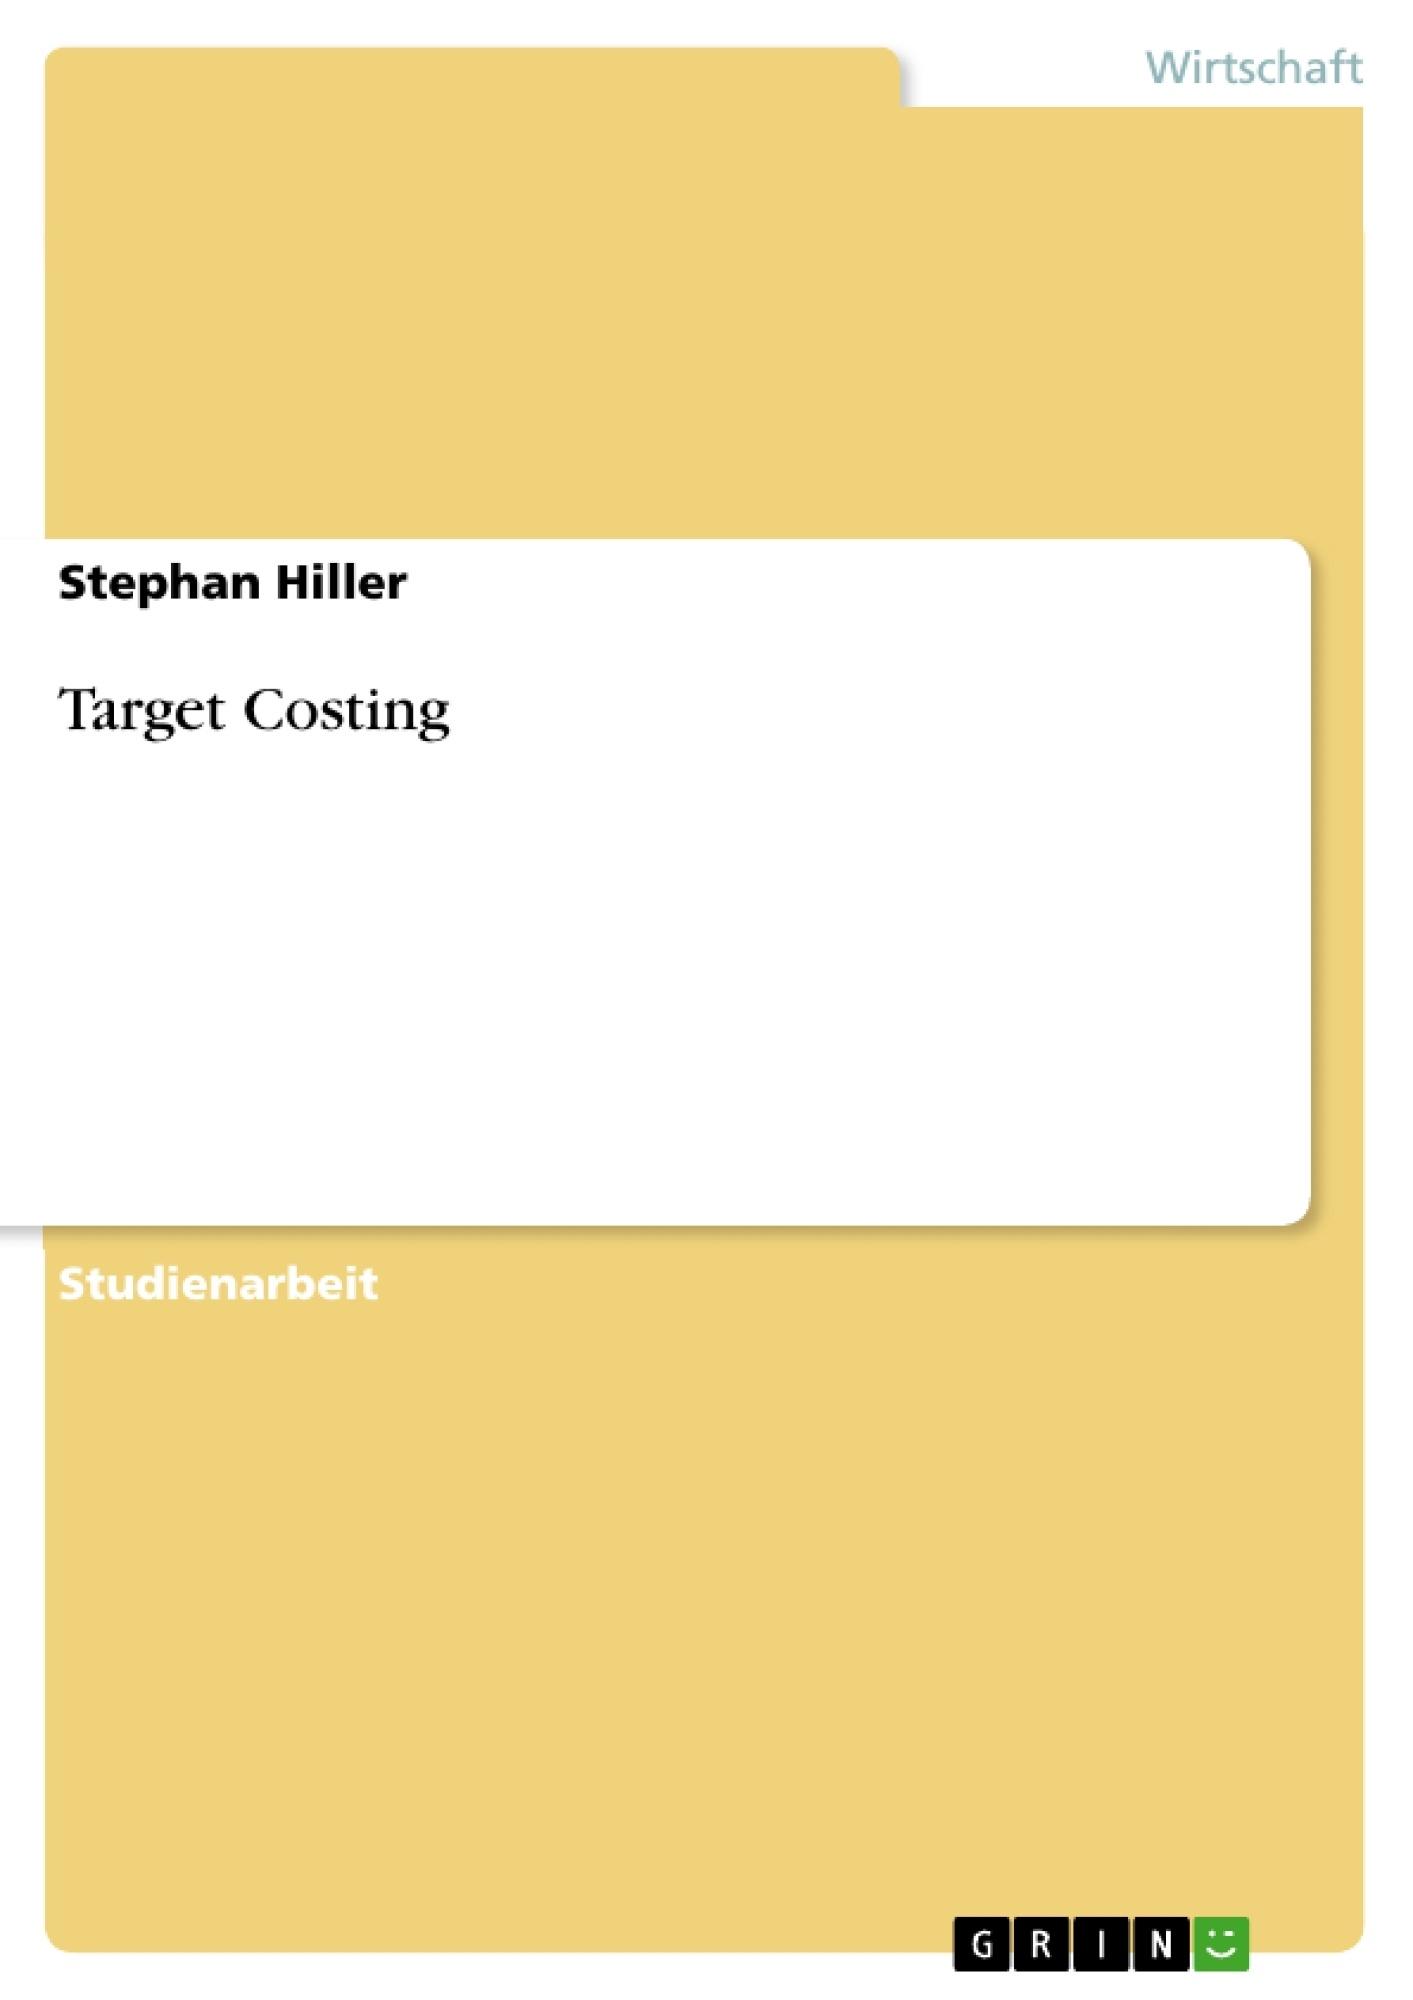 Titel: Target Costing